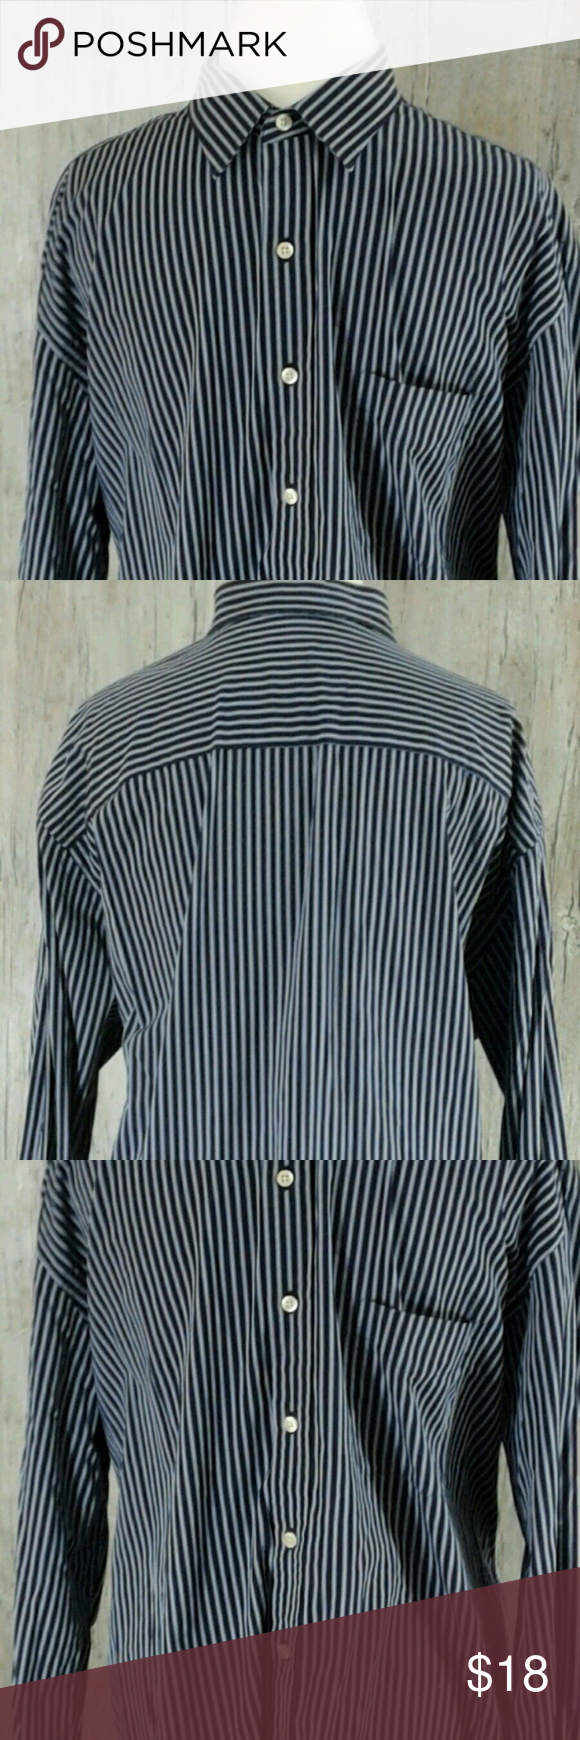 Austin Reed London Men S Ls Striped Shirt Xl Striped Shirt Blue Striped Shirt Striped